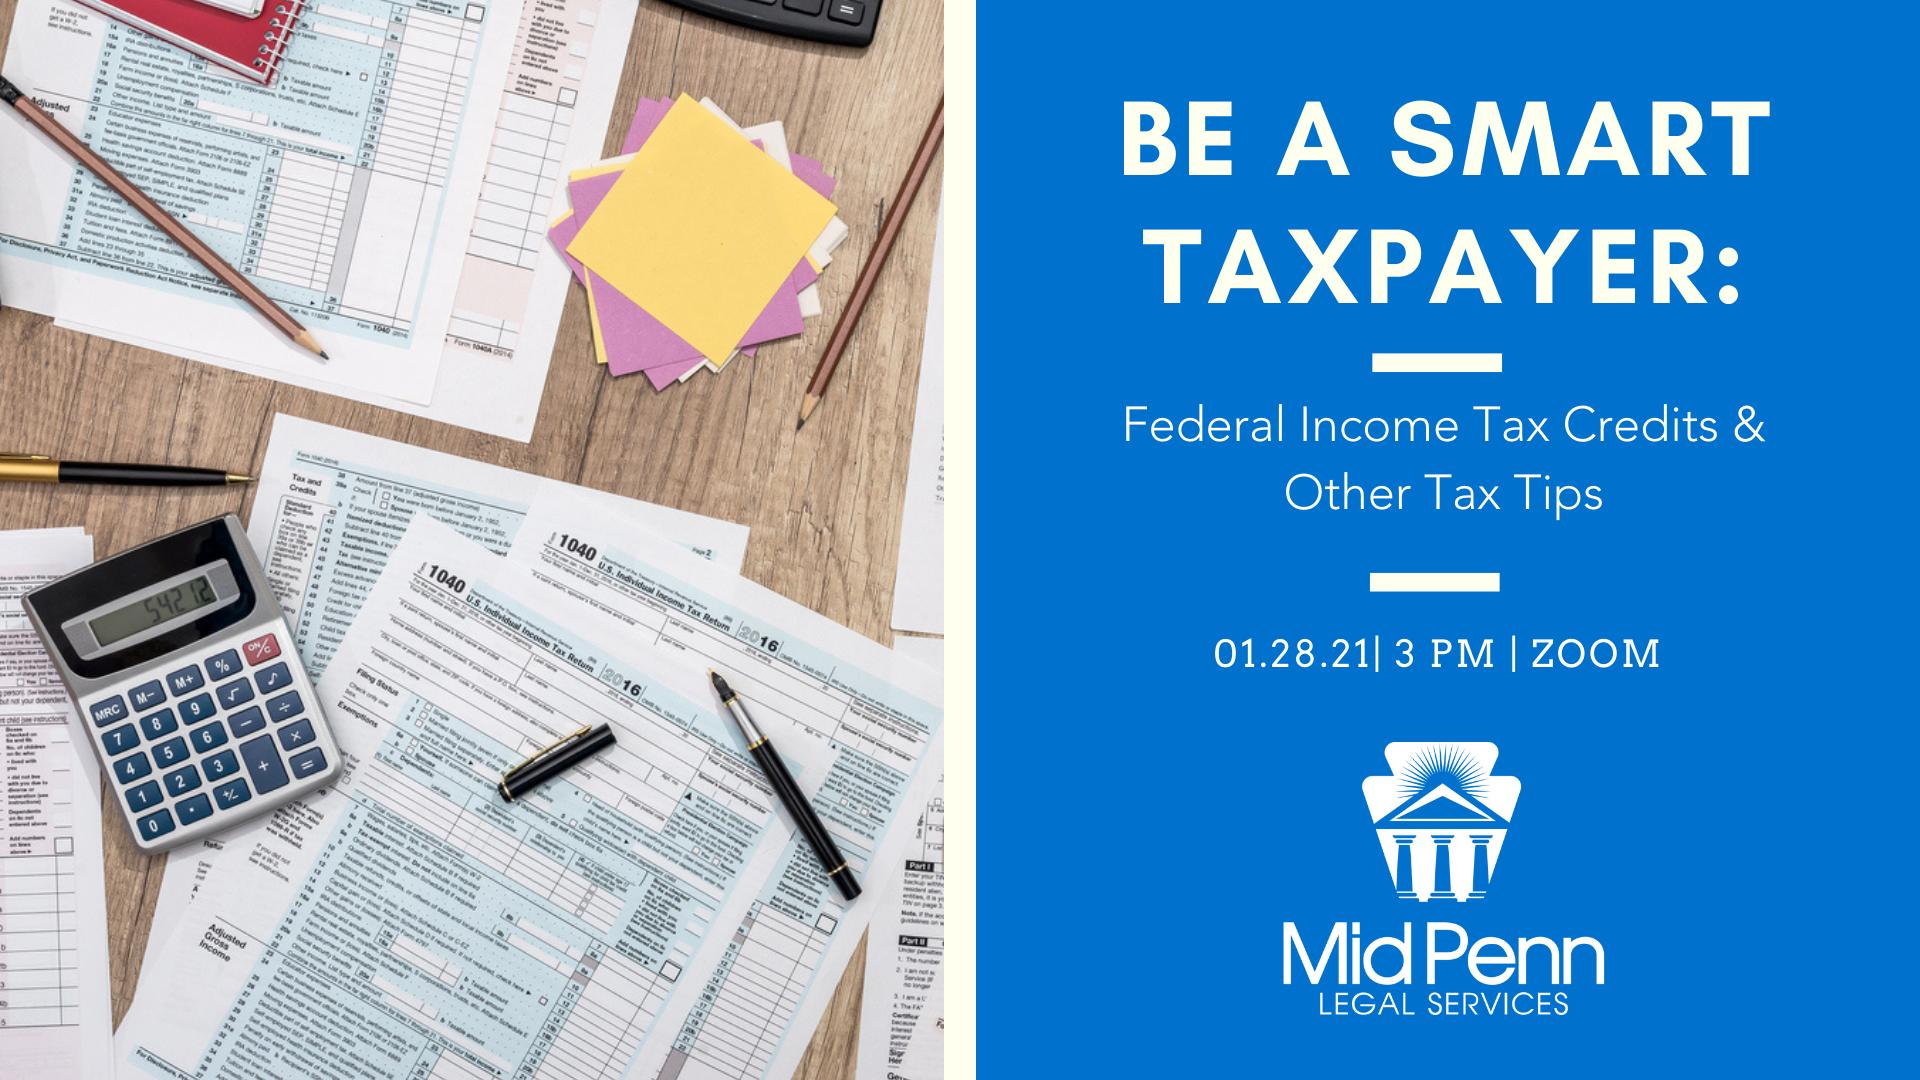 Be A Smart Taxpayer - Webinar